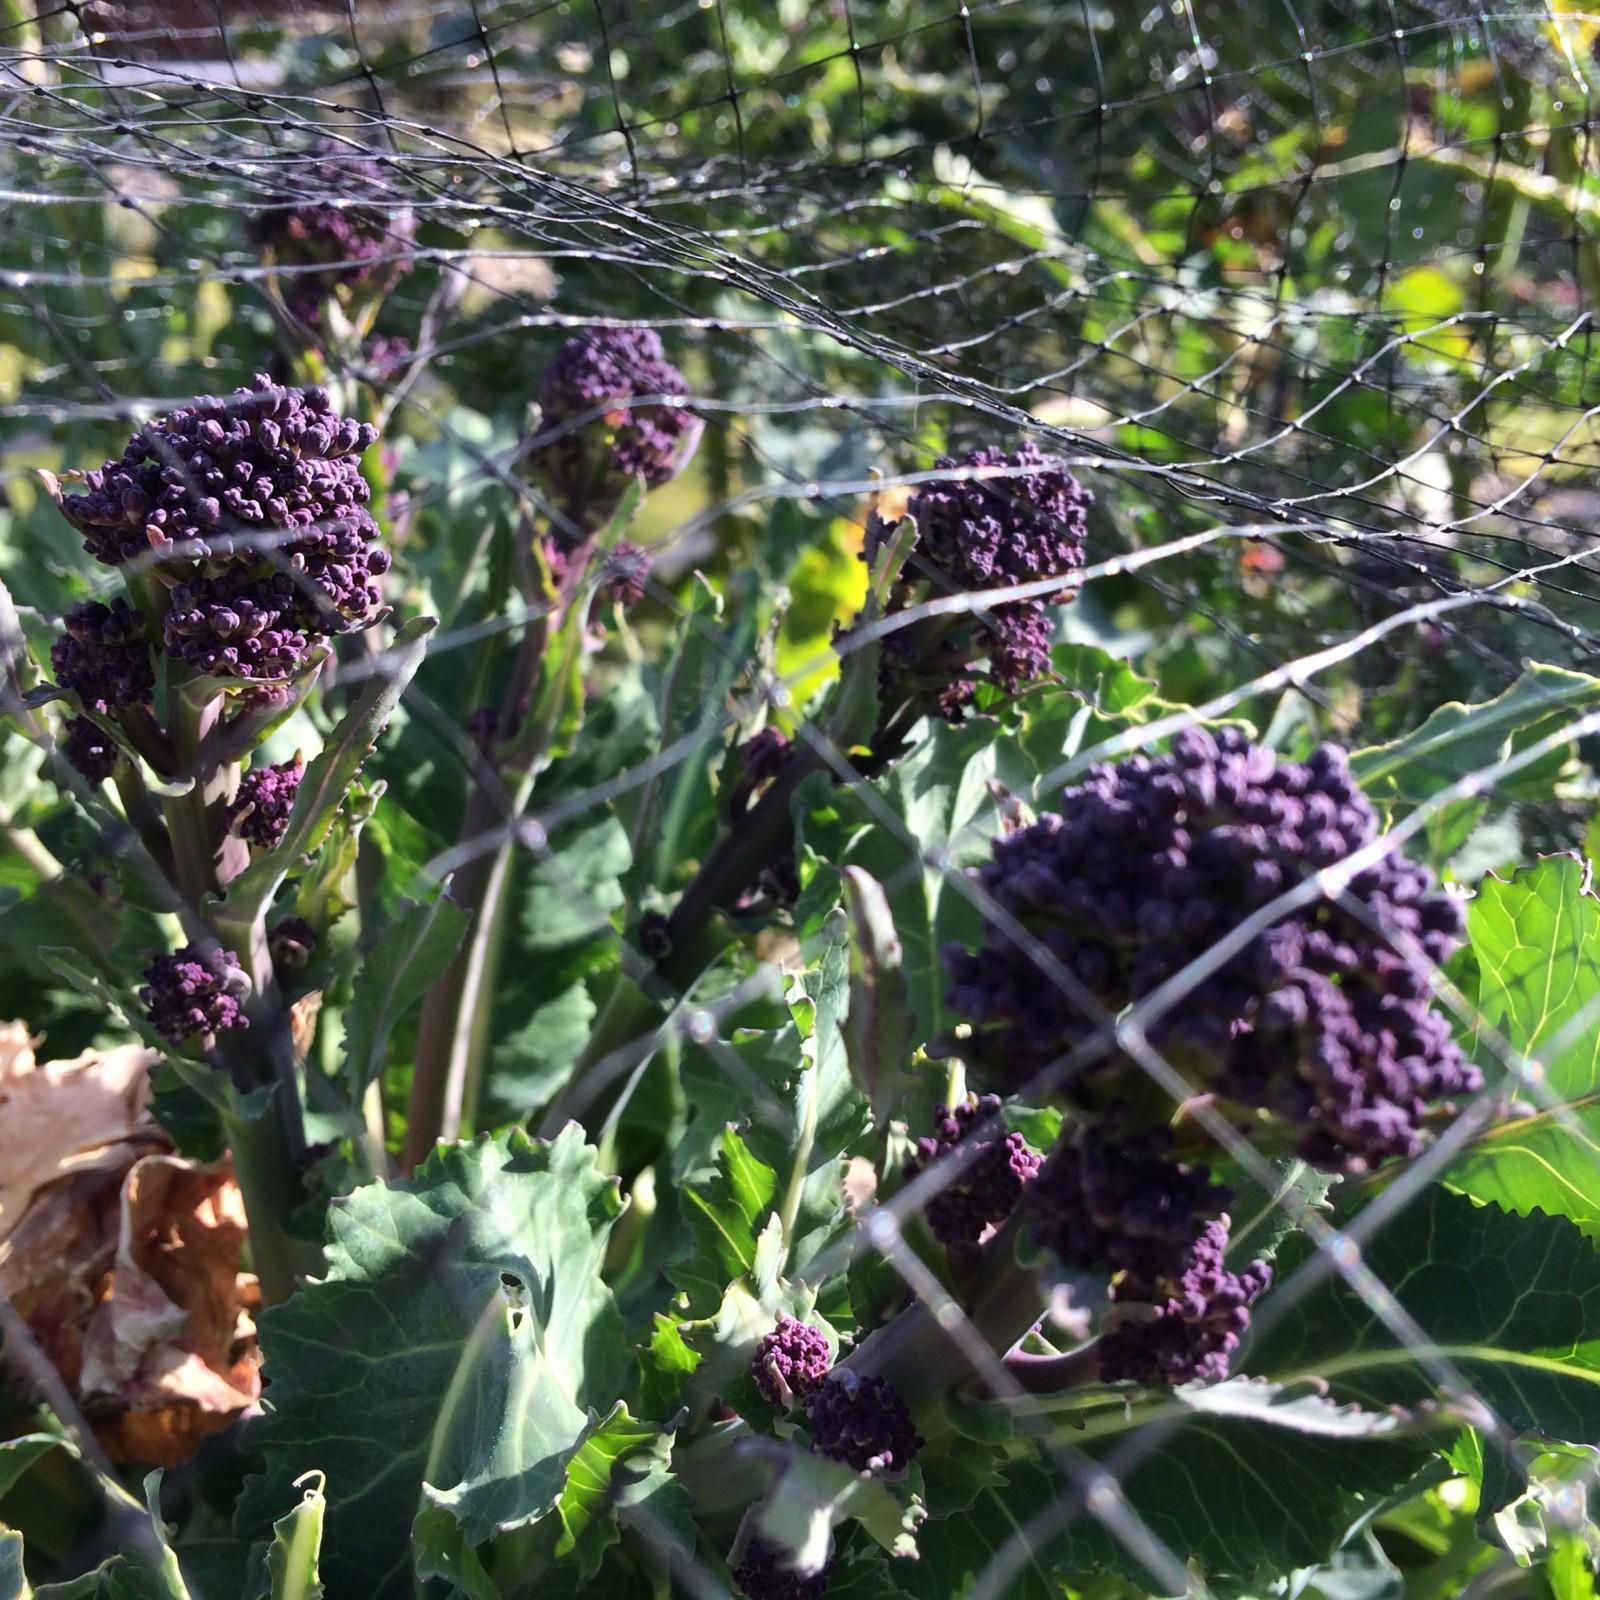 Slow Garden Chronicle: Brassicas